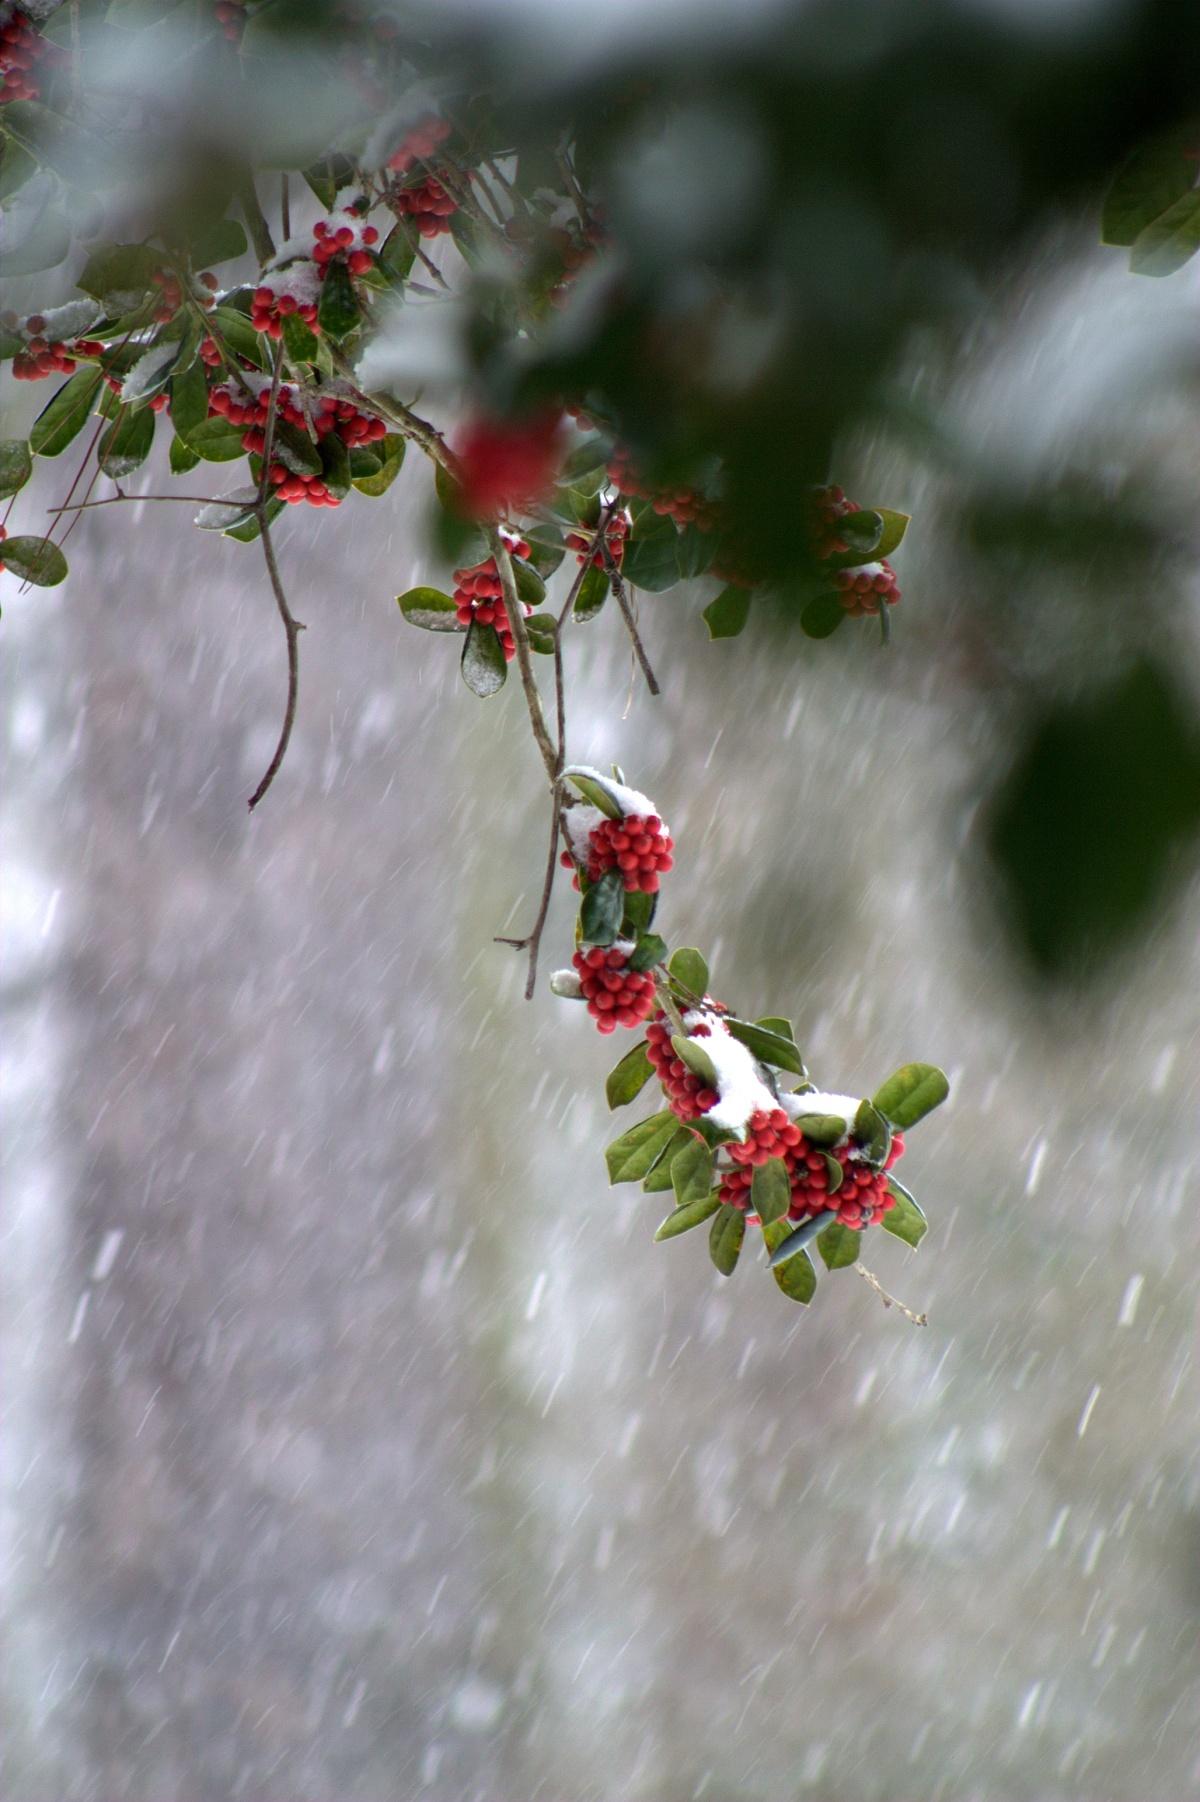 Photography ~ It's SNOWING, Fayetteville, North Carolina,02/24